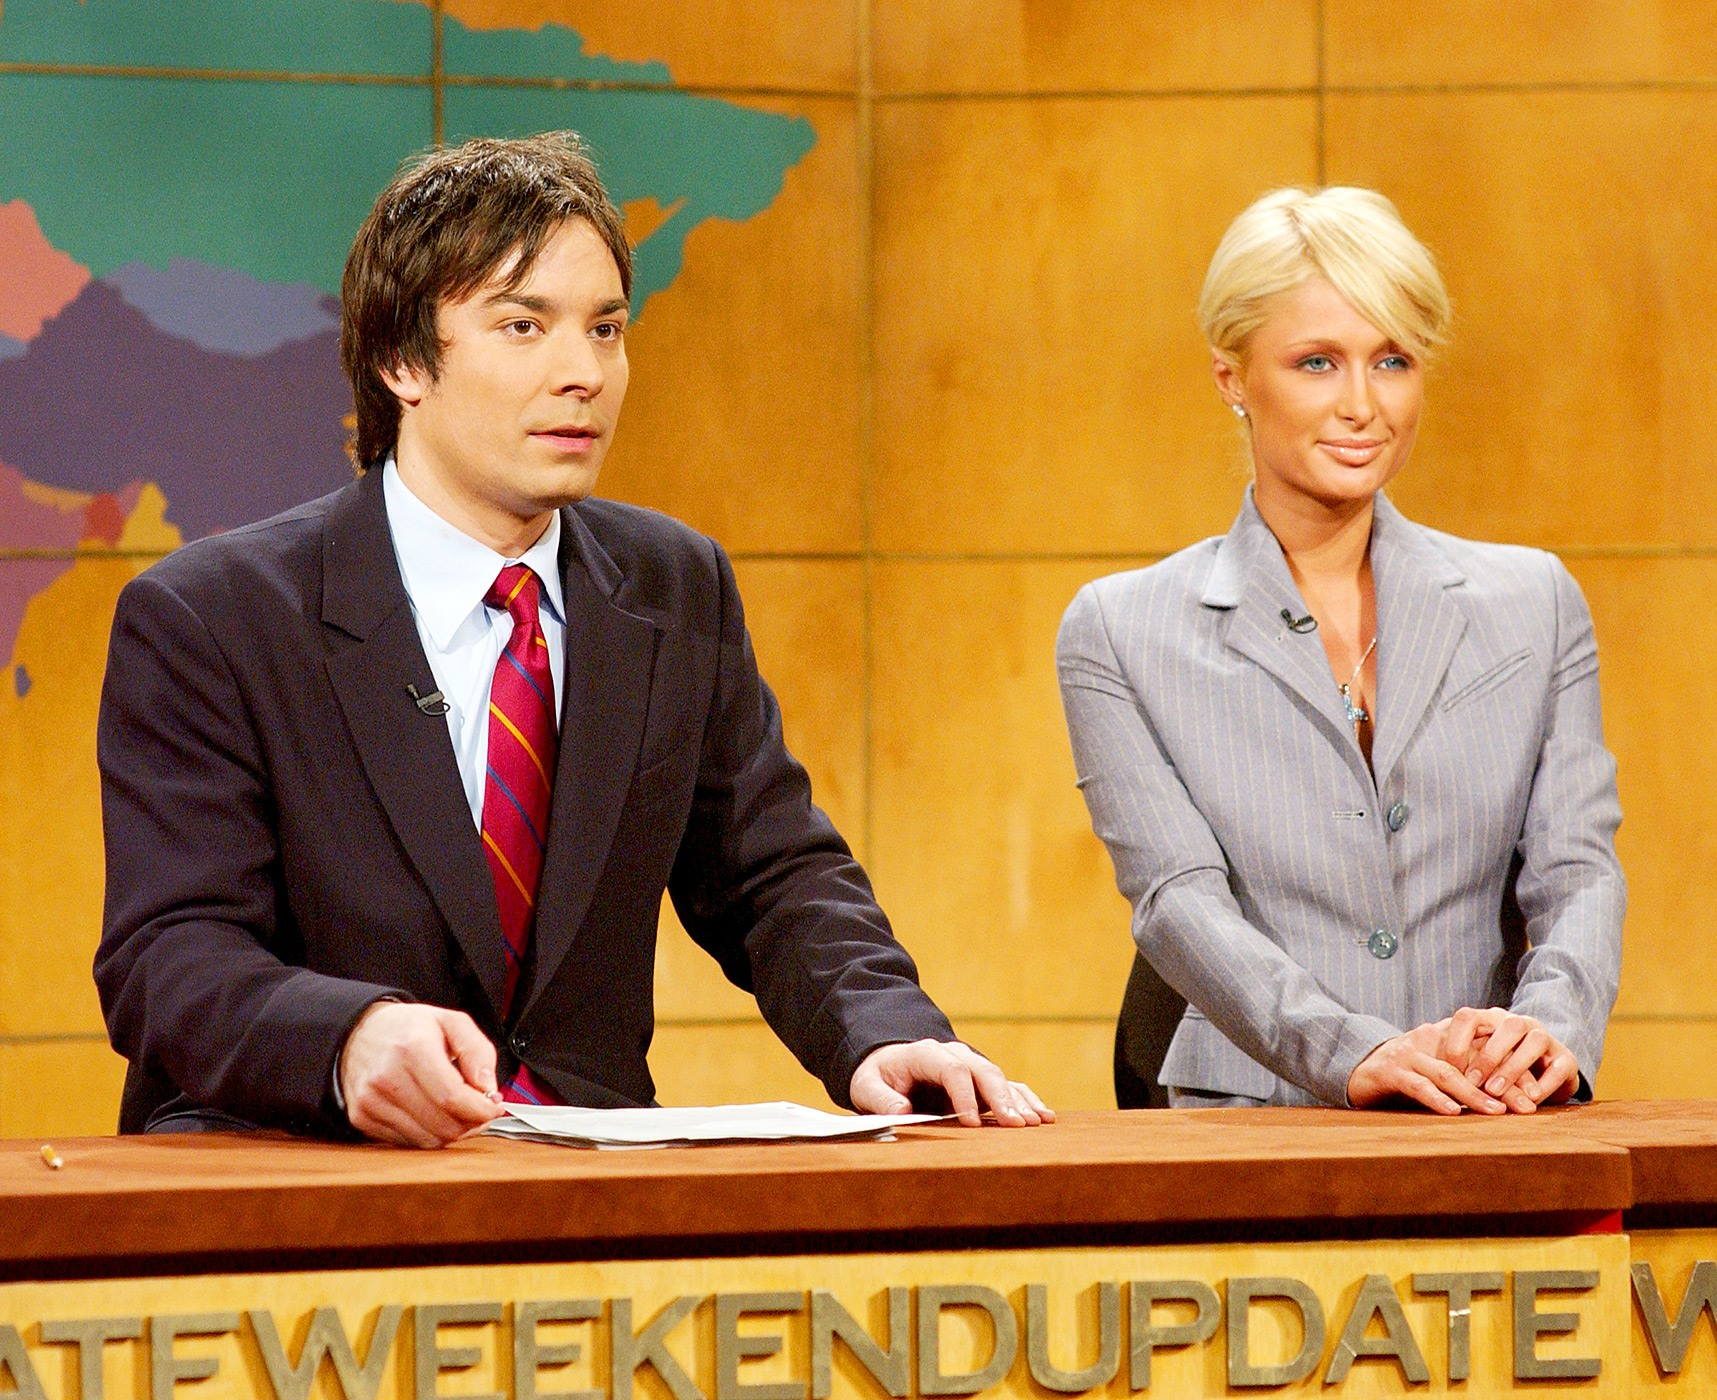 Jimmy Fallon and Paris Hilton on Saturday Night Live